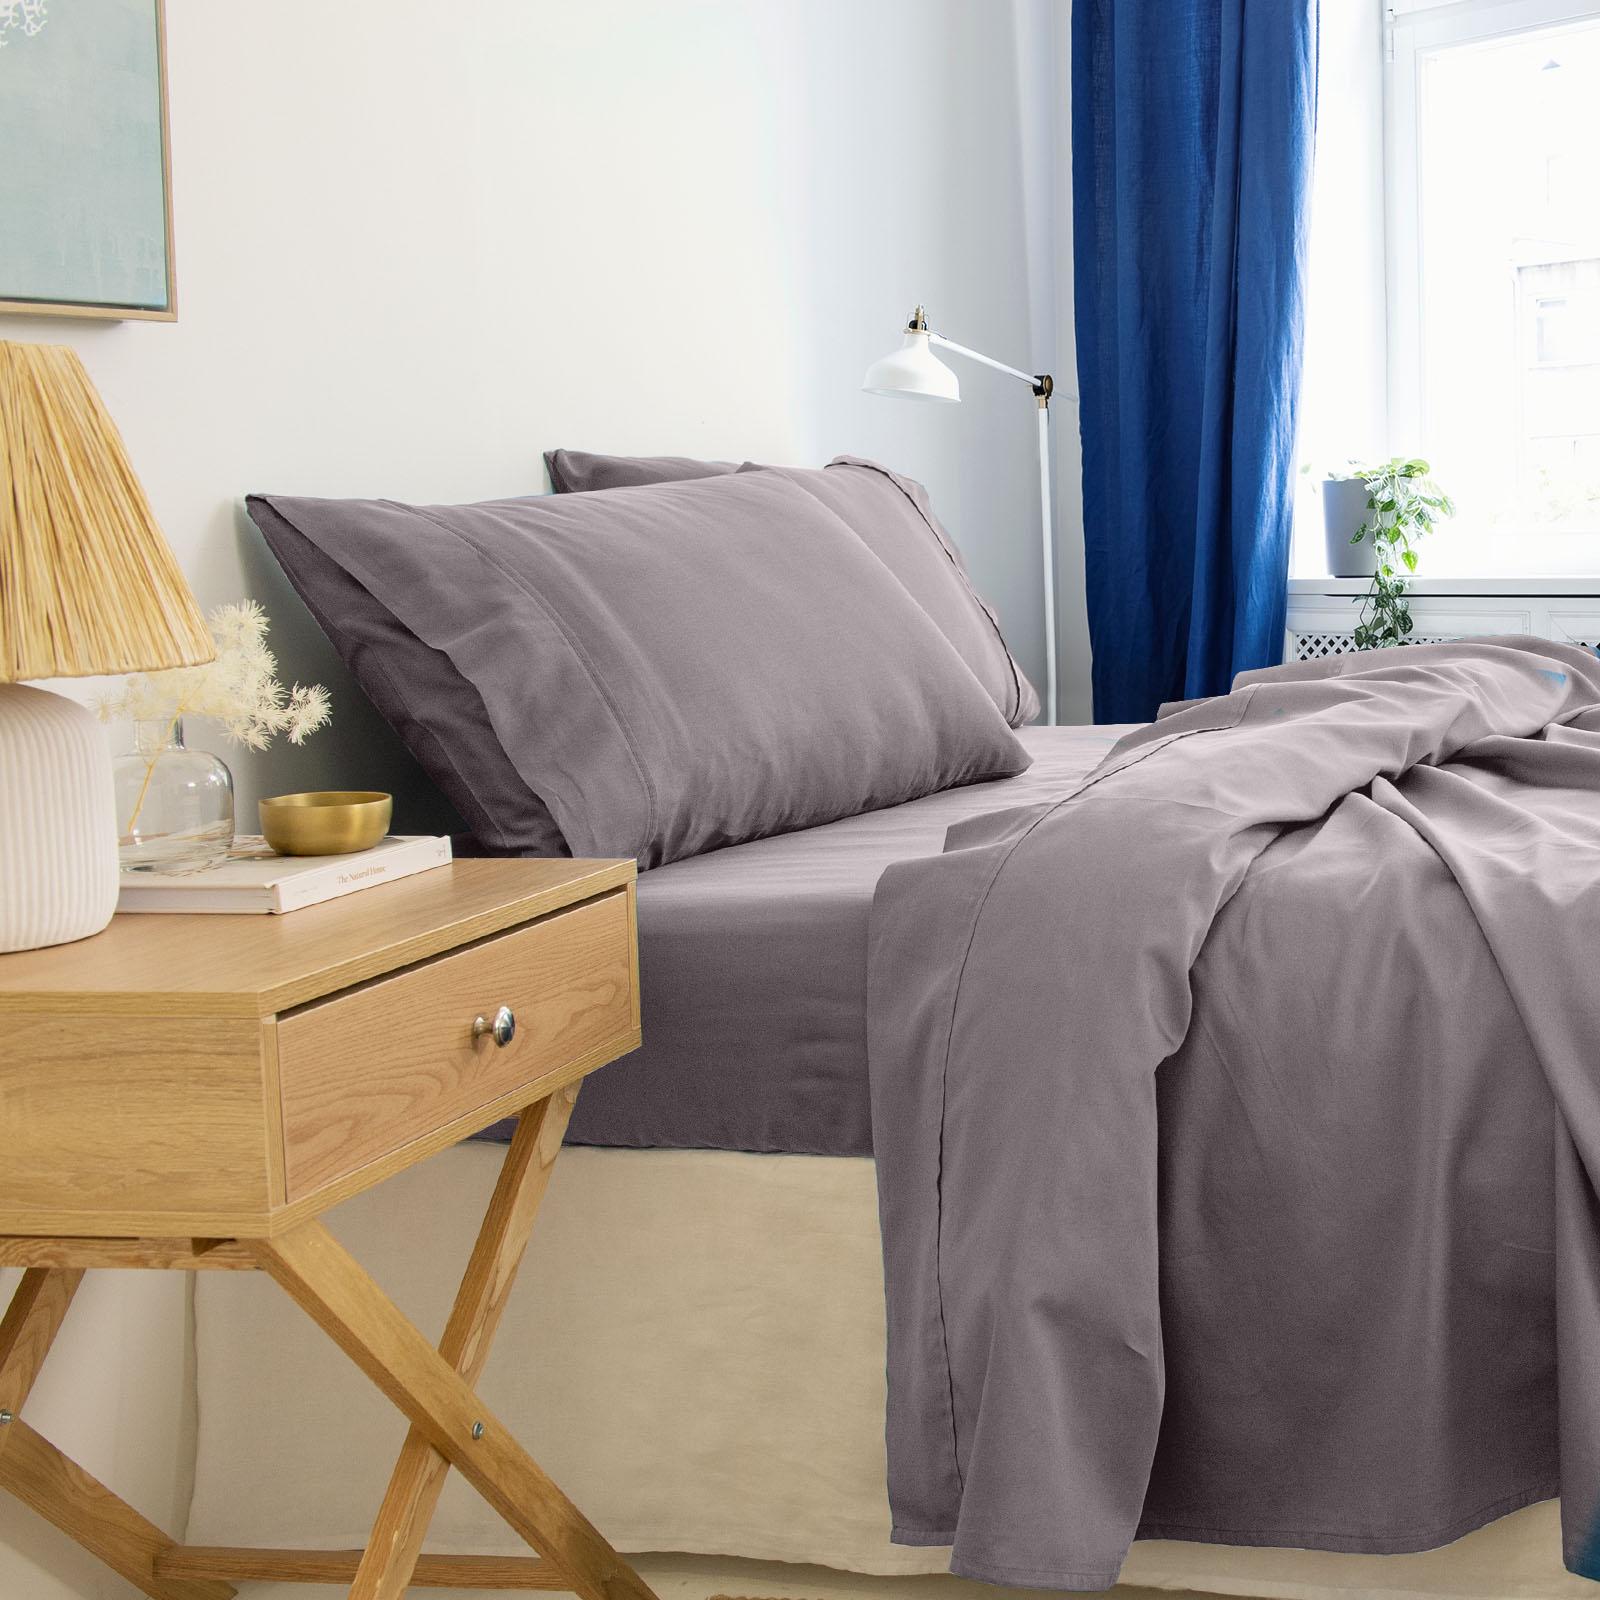 thumbnail 48 - Royal Comfort 1000TC Hotel Grade Bamboo Cotton Sheets Pillowcases Set Ultrasoft